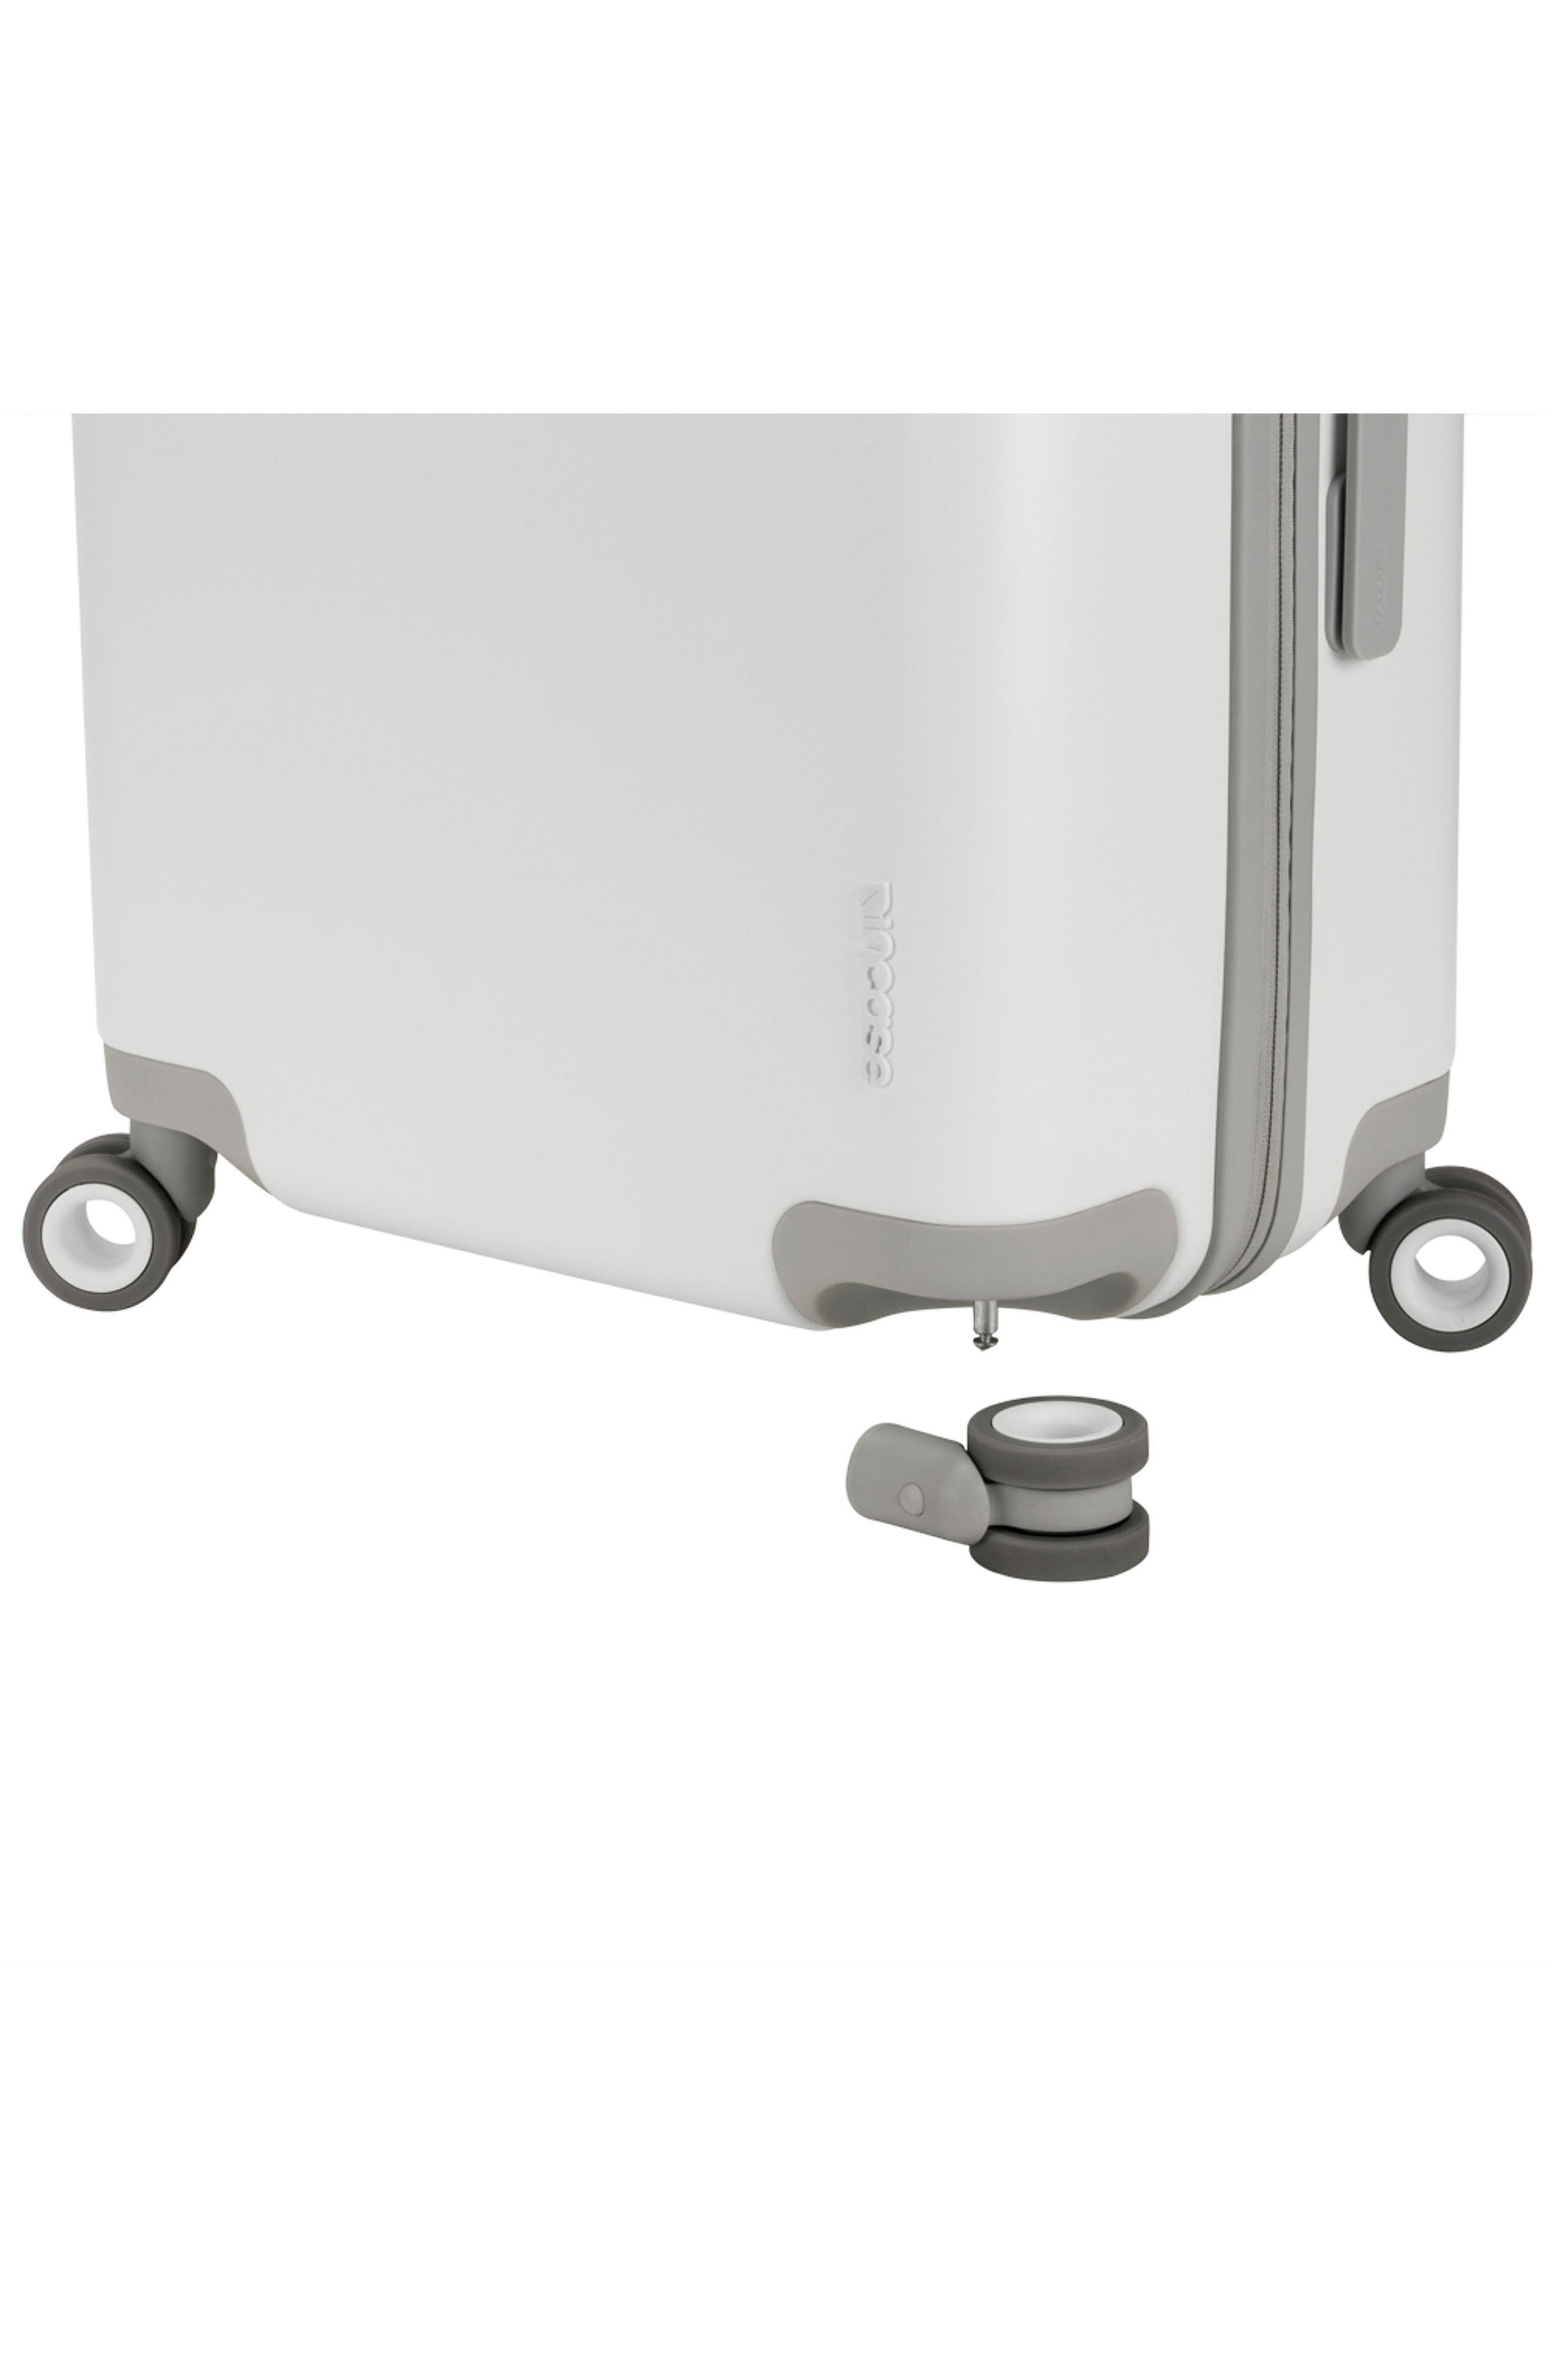 NOVI 27-Inch Hardshell Wheeled Packing Case,                             Alternate thumbnail 8, color,                             White